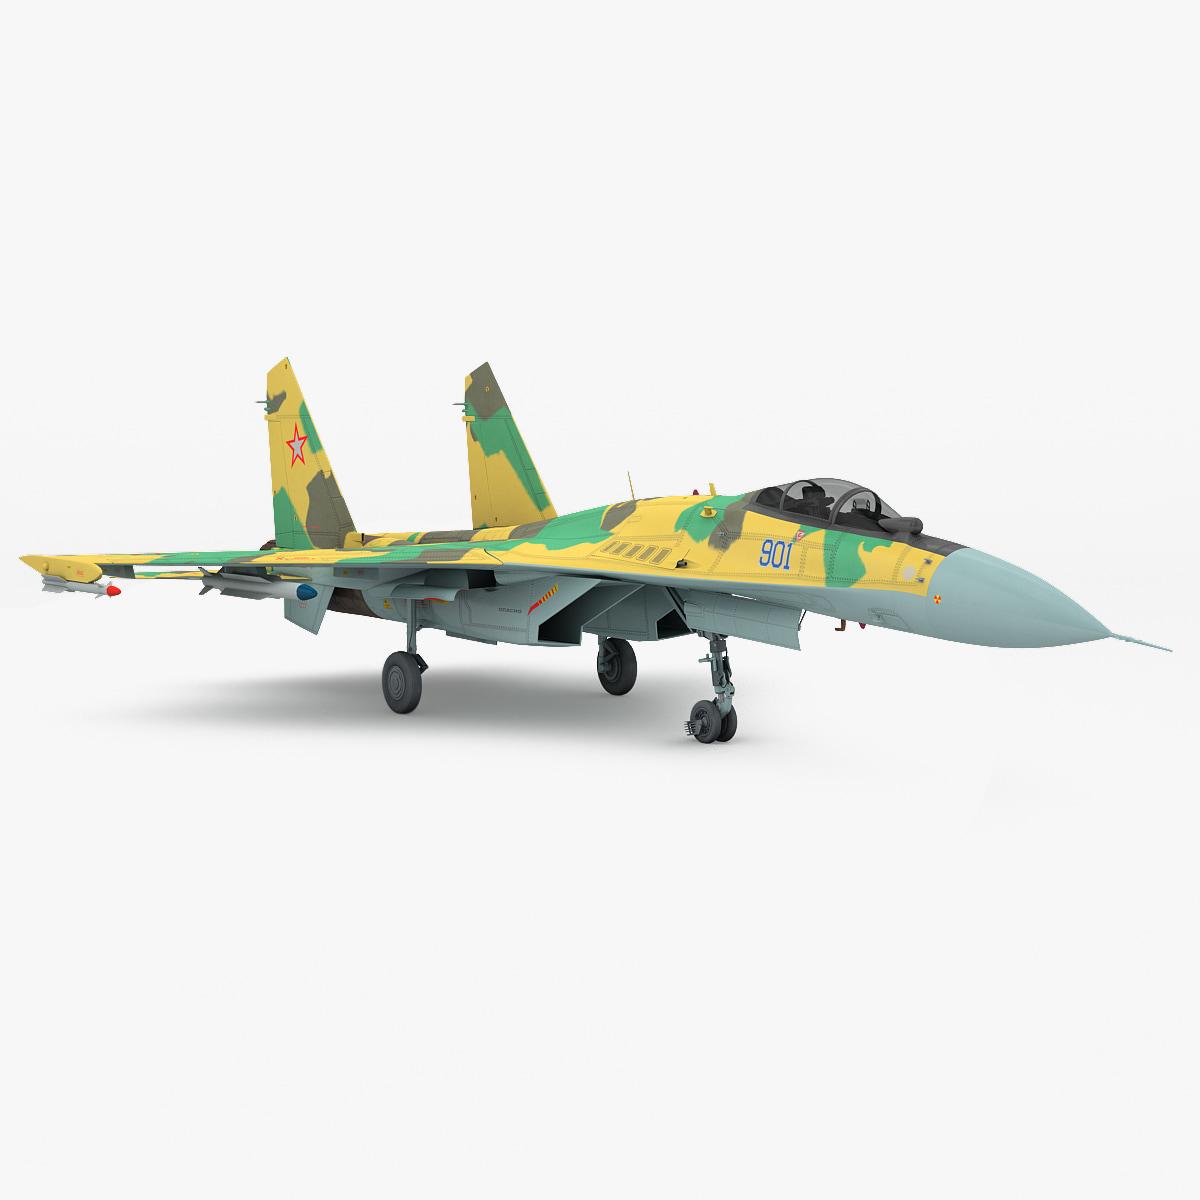 Russian_Multirole_Fighter_Sukhoi_Su-35_v2_Static_000.jpg